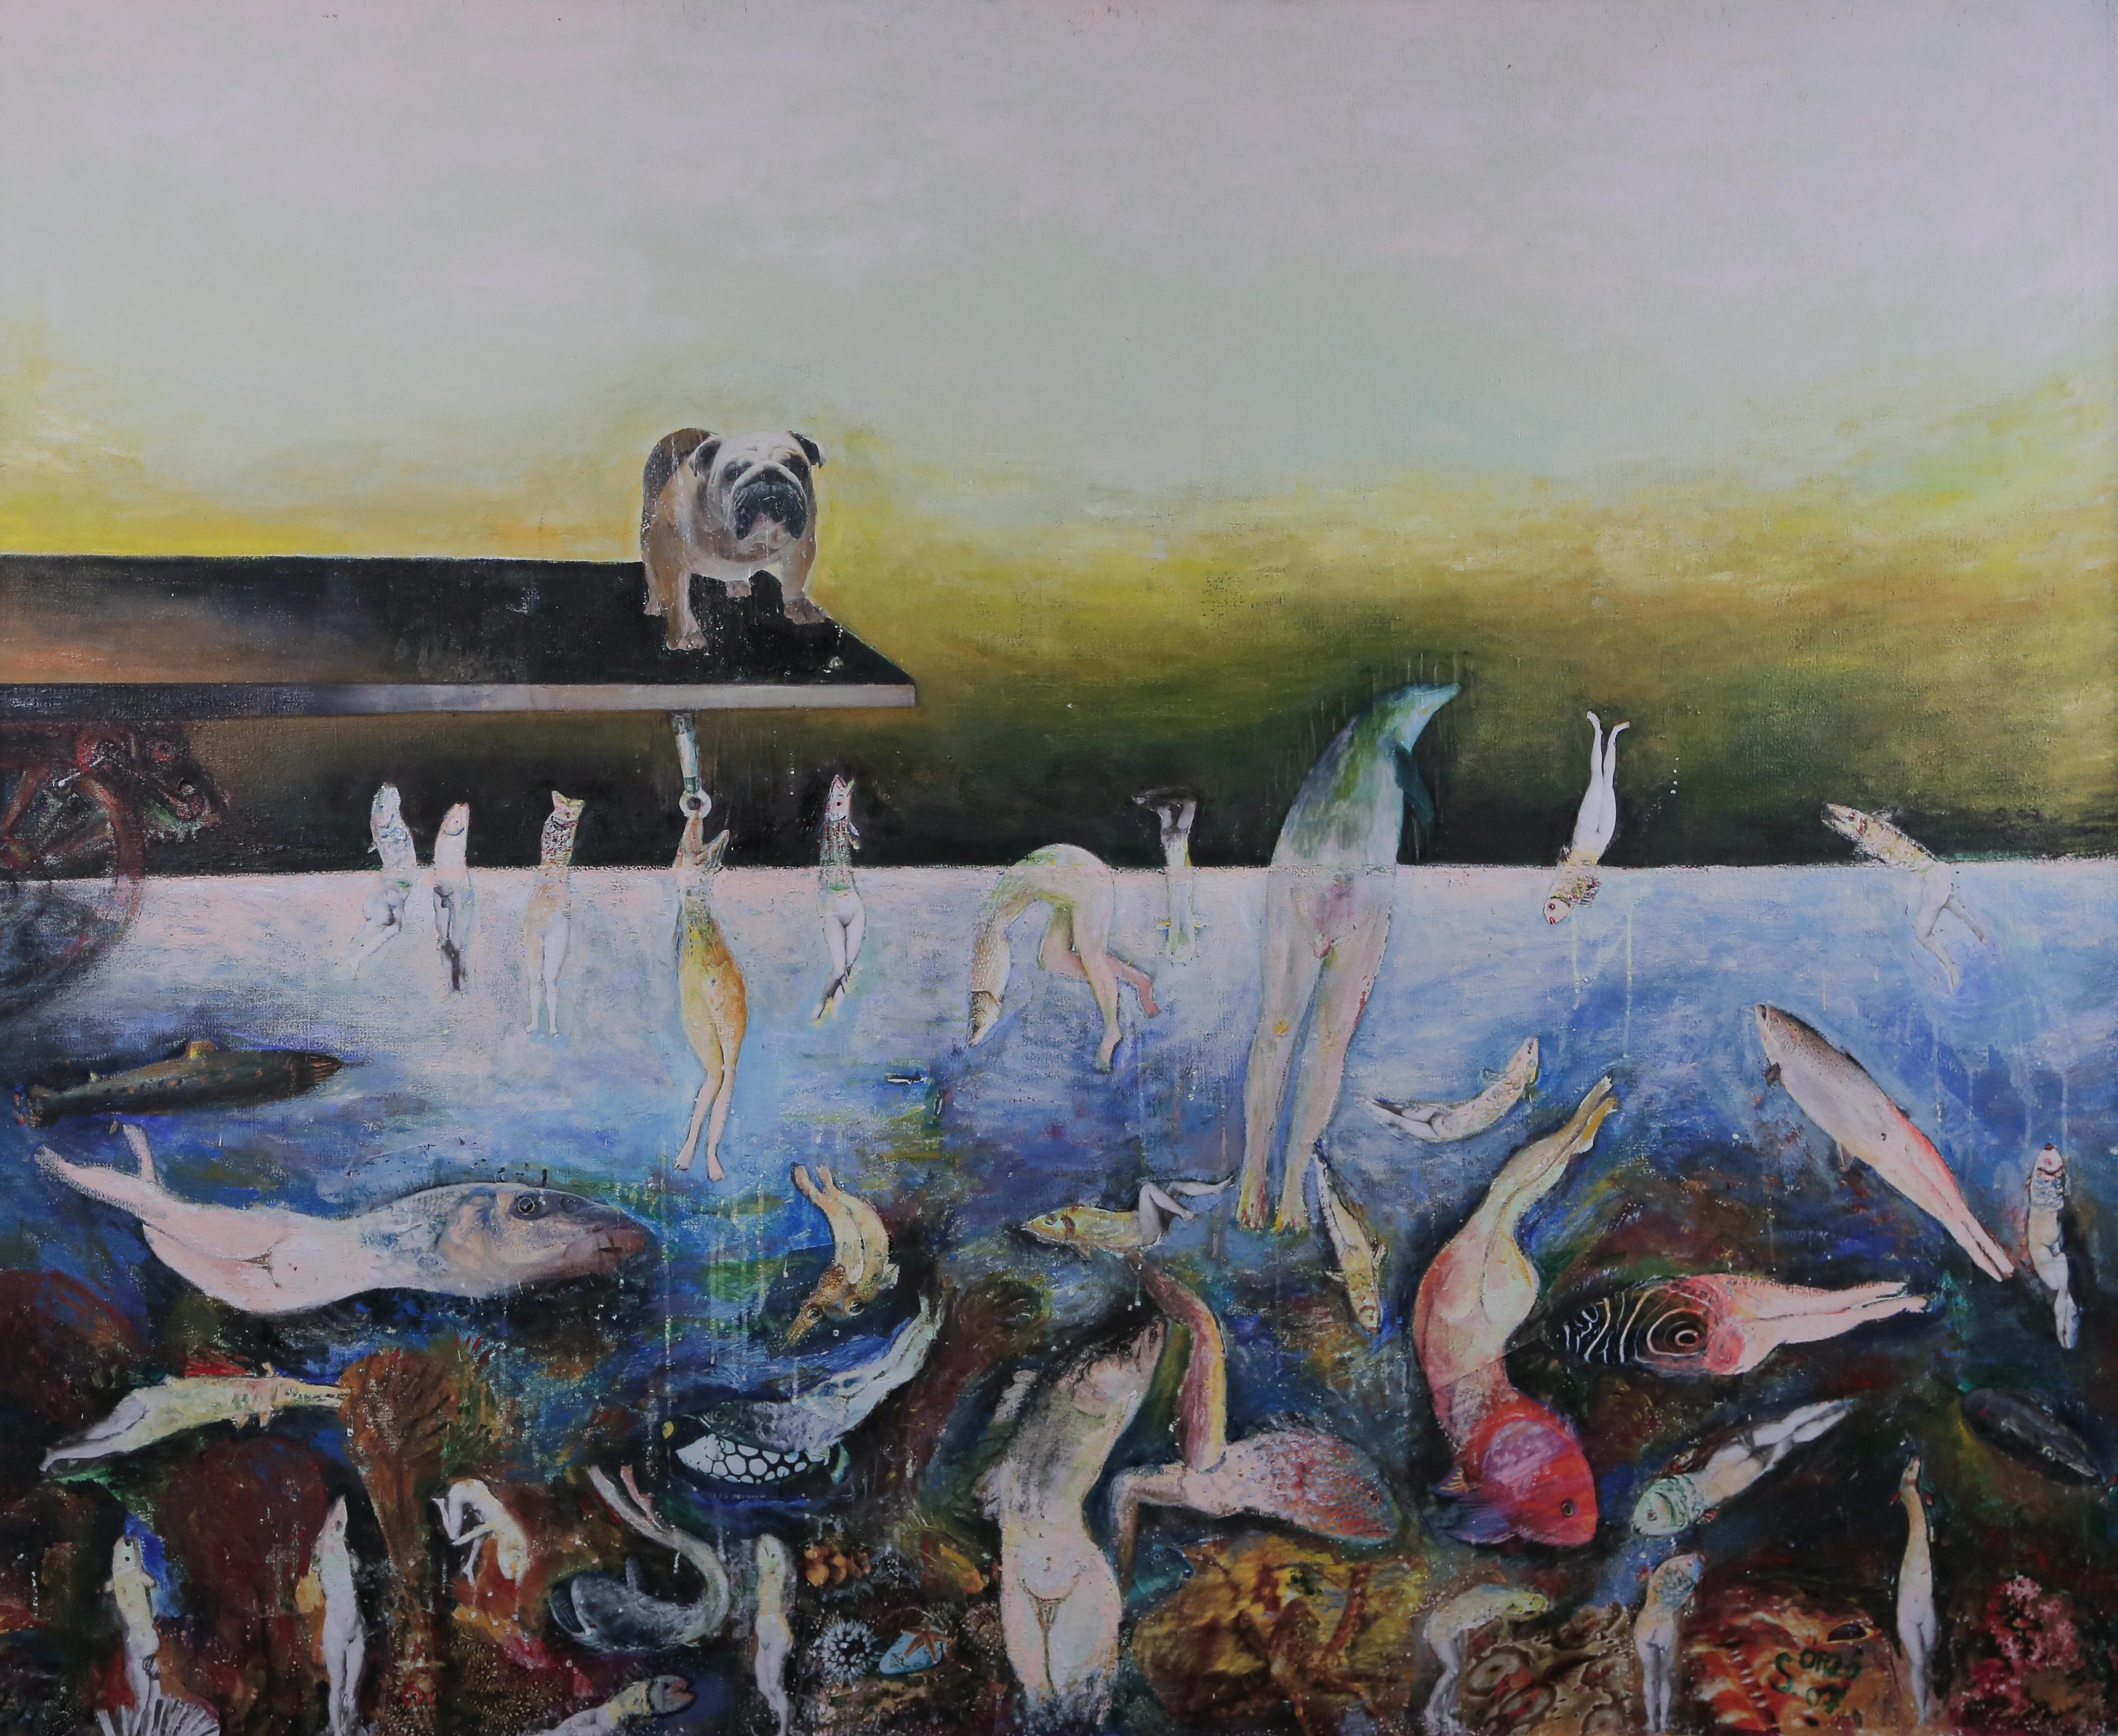 Guardian, Szilard Szilagyi, Figurative Oil Painting, Expressionist, Yellow, Blue